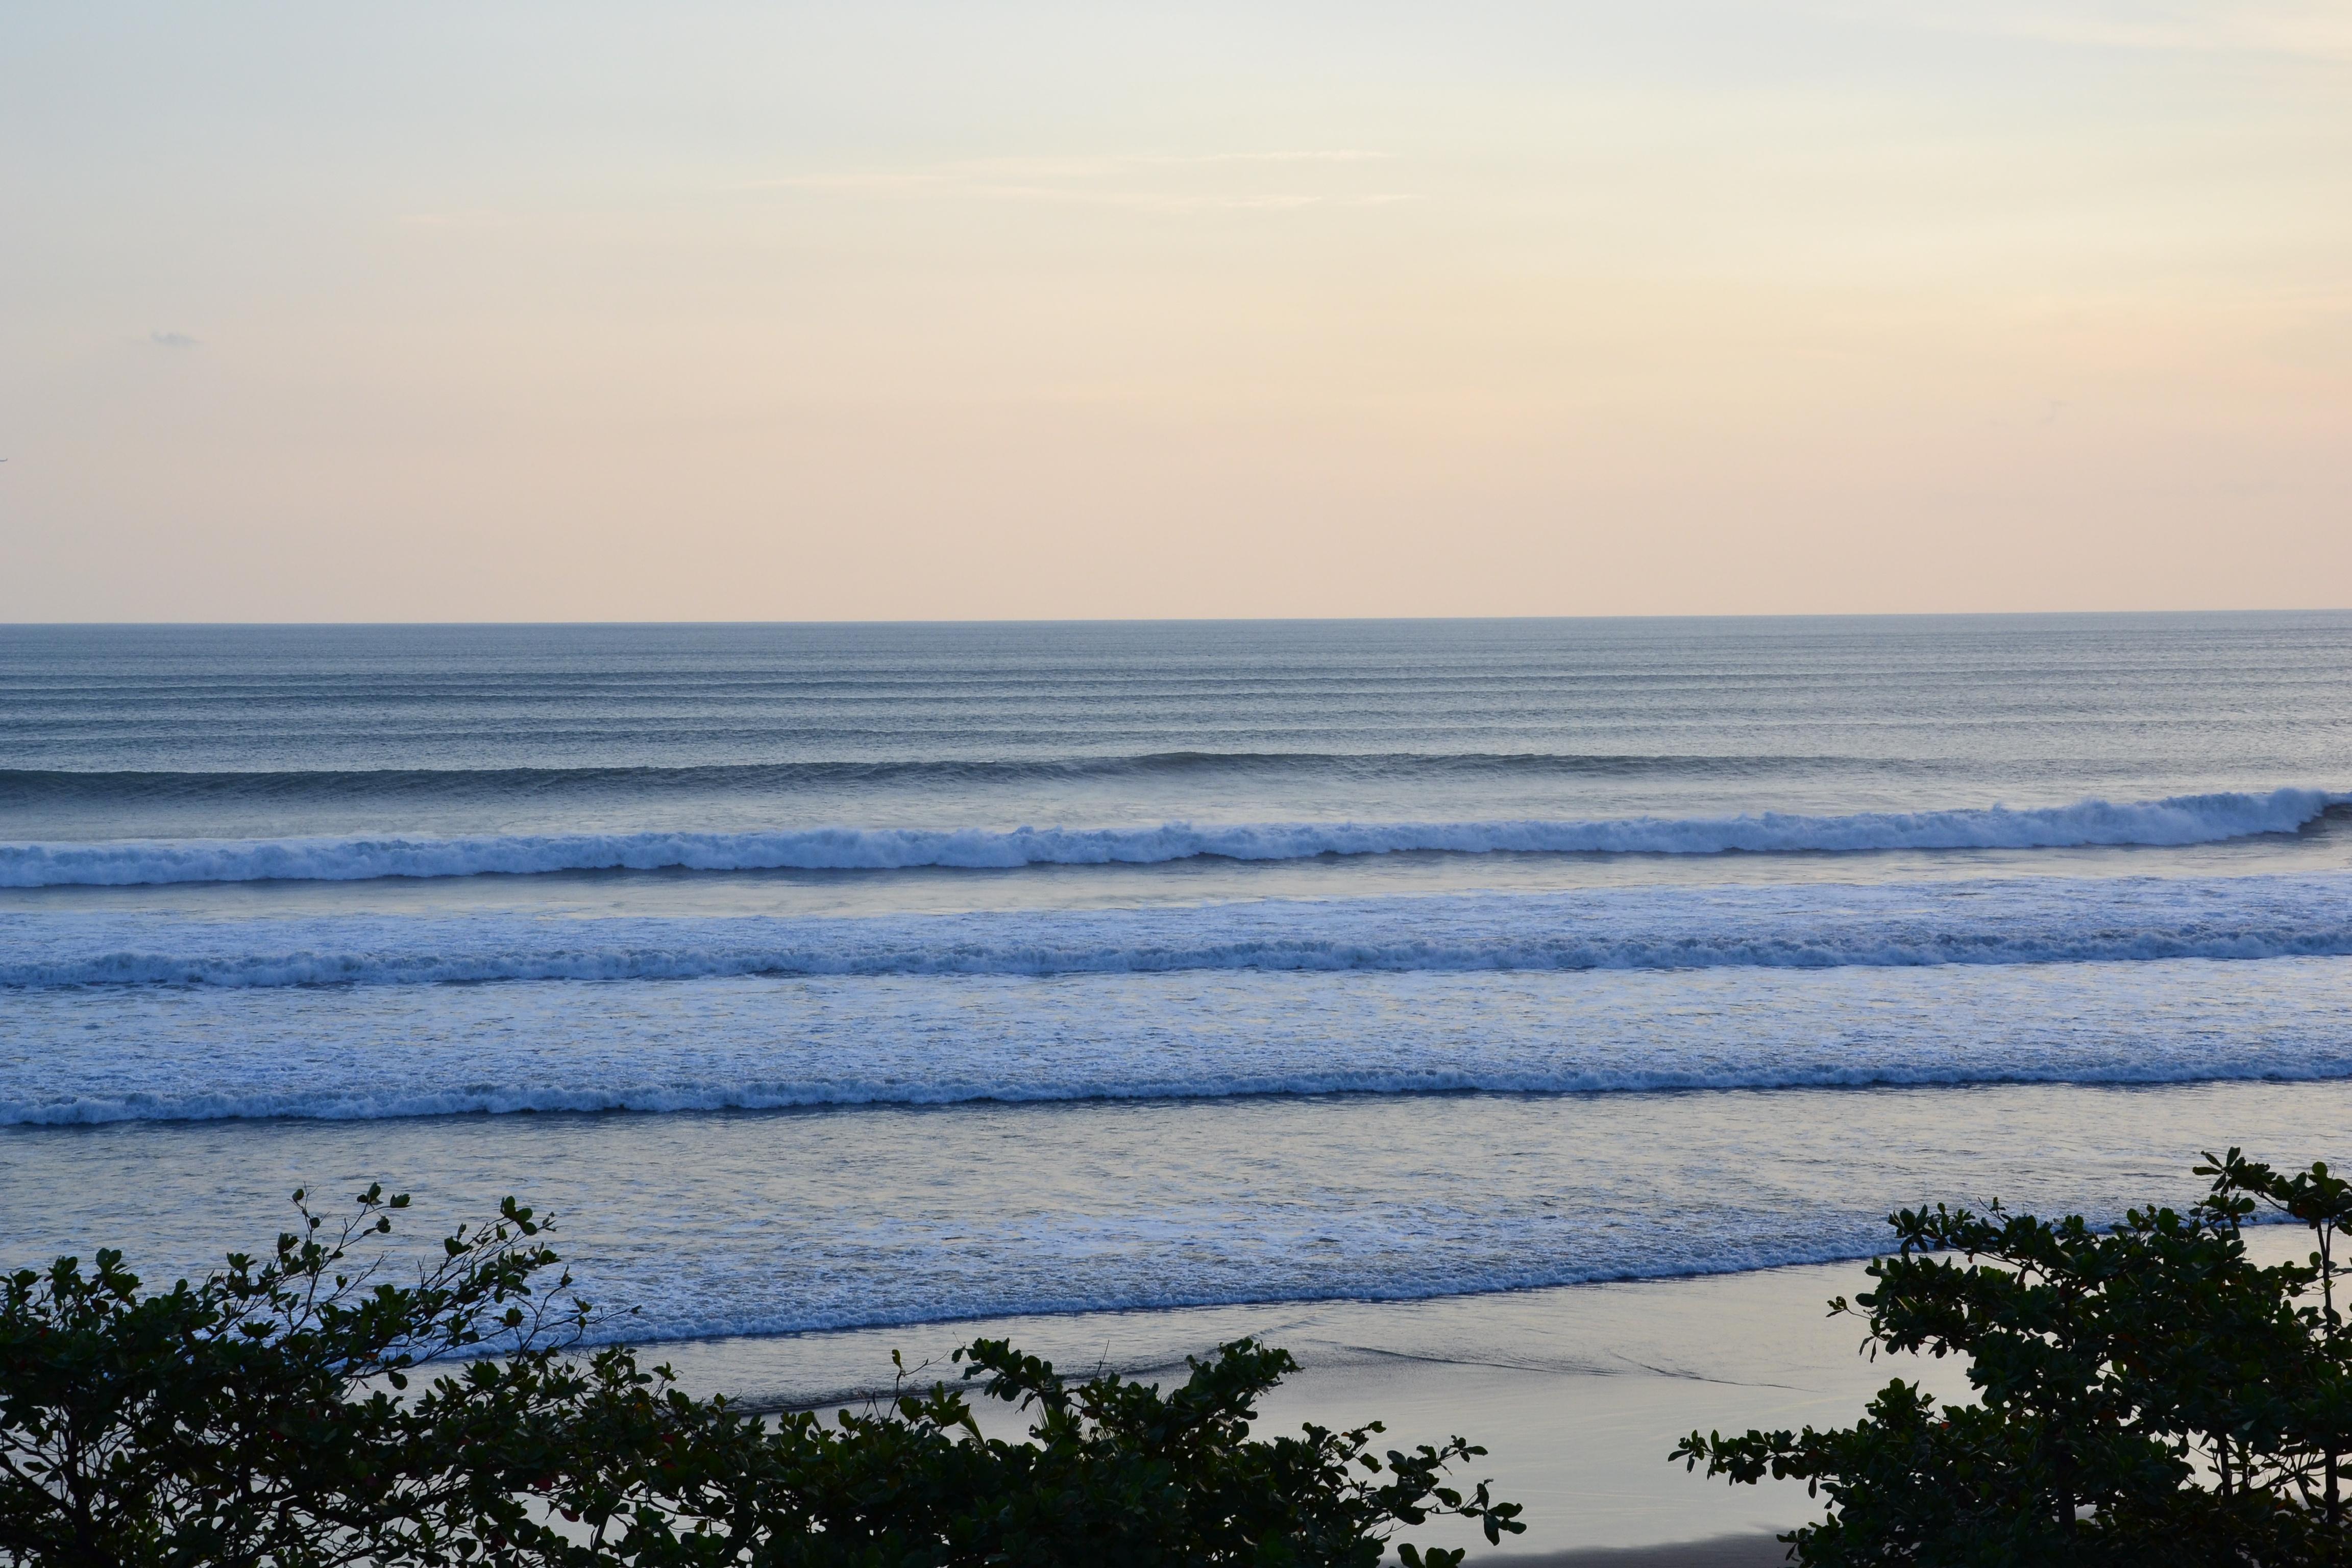 bali_surf_6924452968